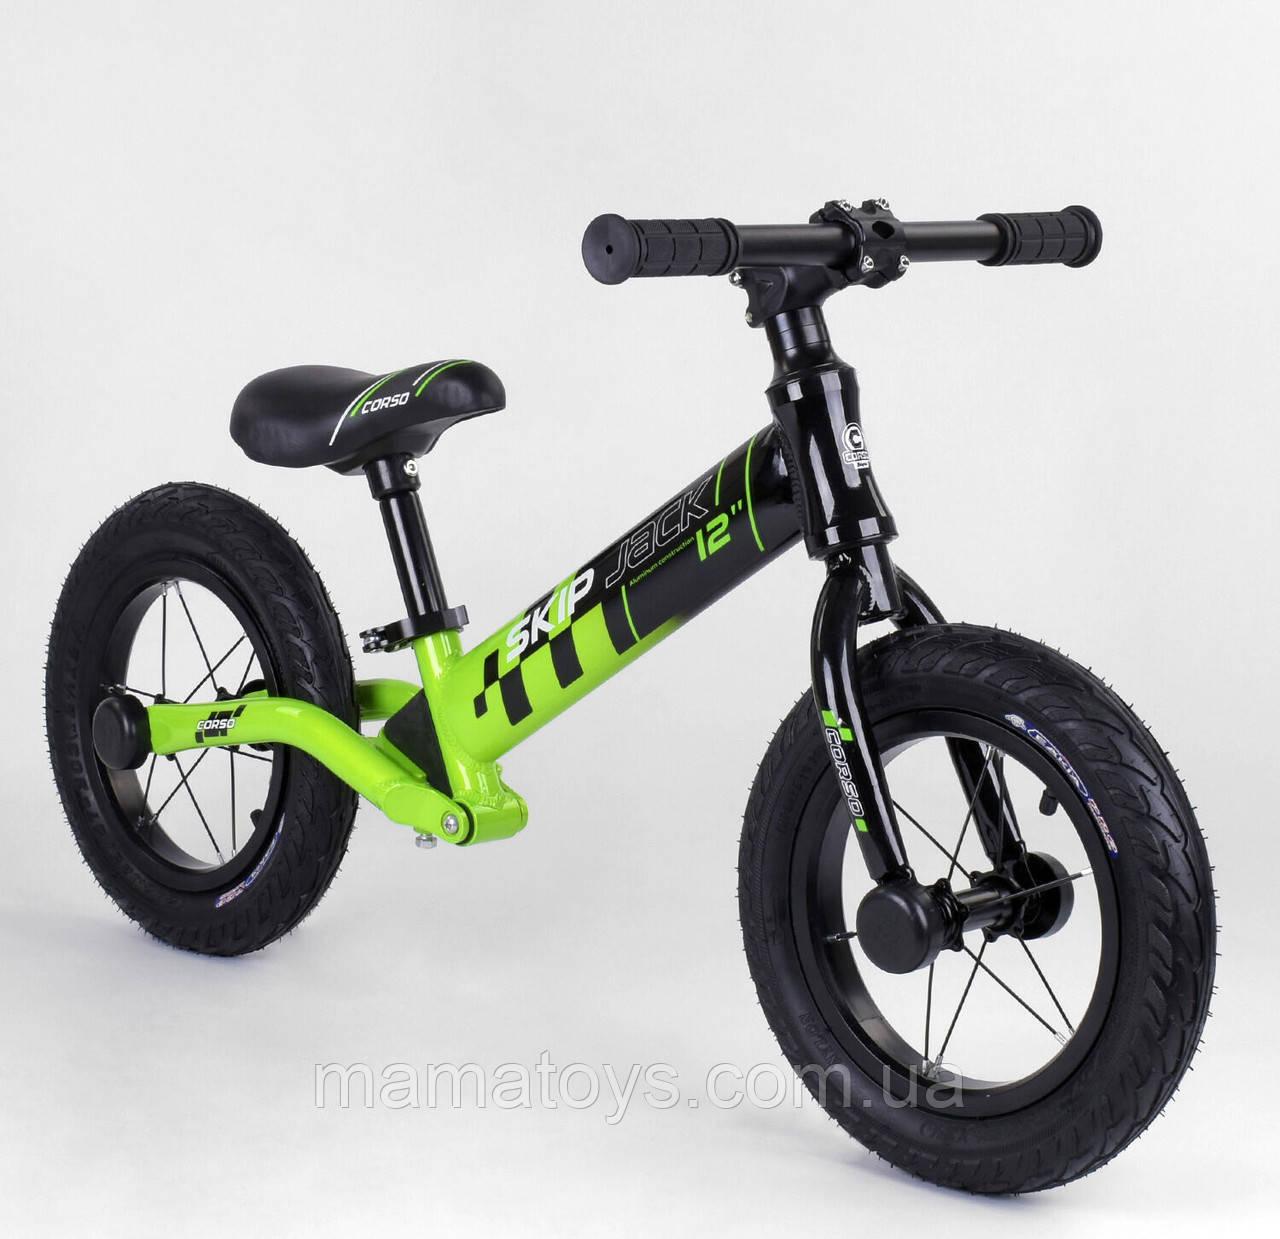 "Велобег 12 ""Corso Skip Jack 95112 Зелений, Надувні колеса, Алюмніевая рама, Амортизатор"